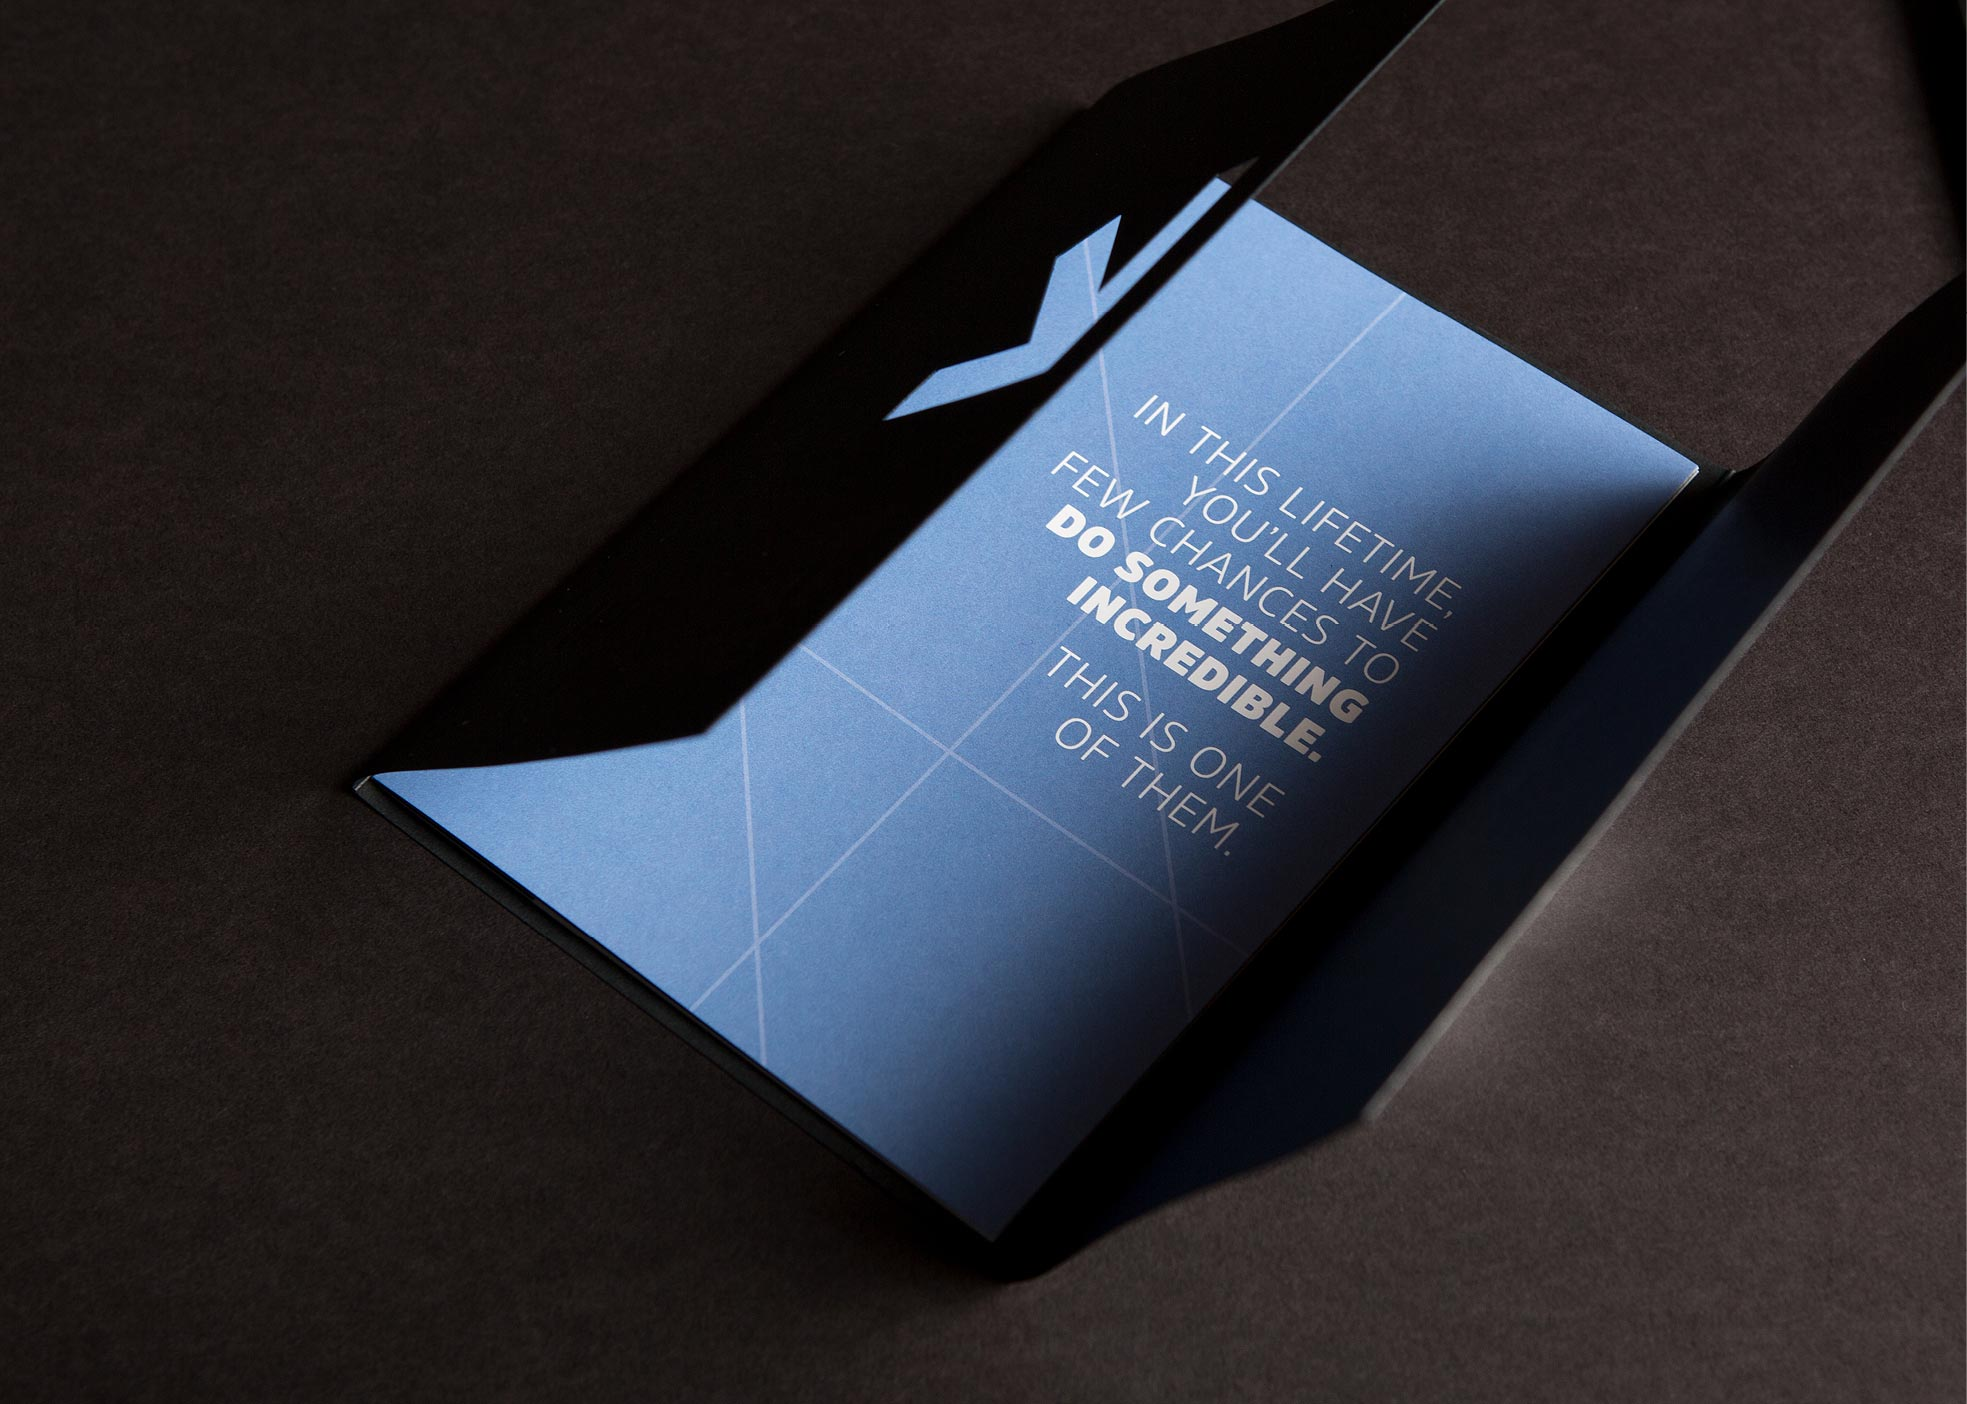 toronto-rehab-foundation-special-gifts-2-sputnik-design-partners.jpg